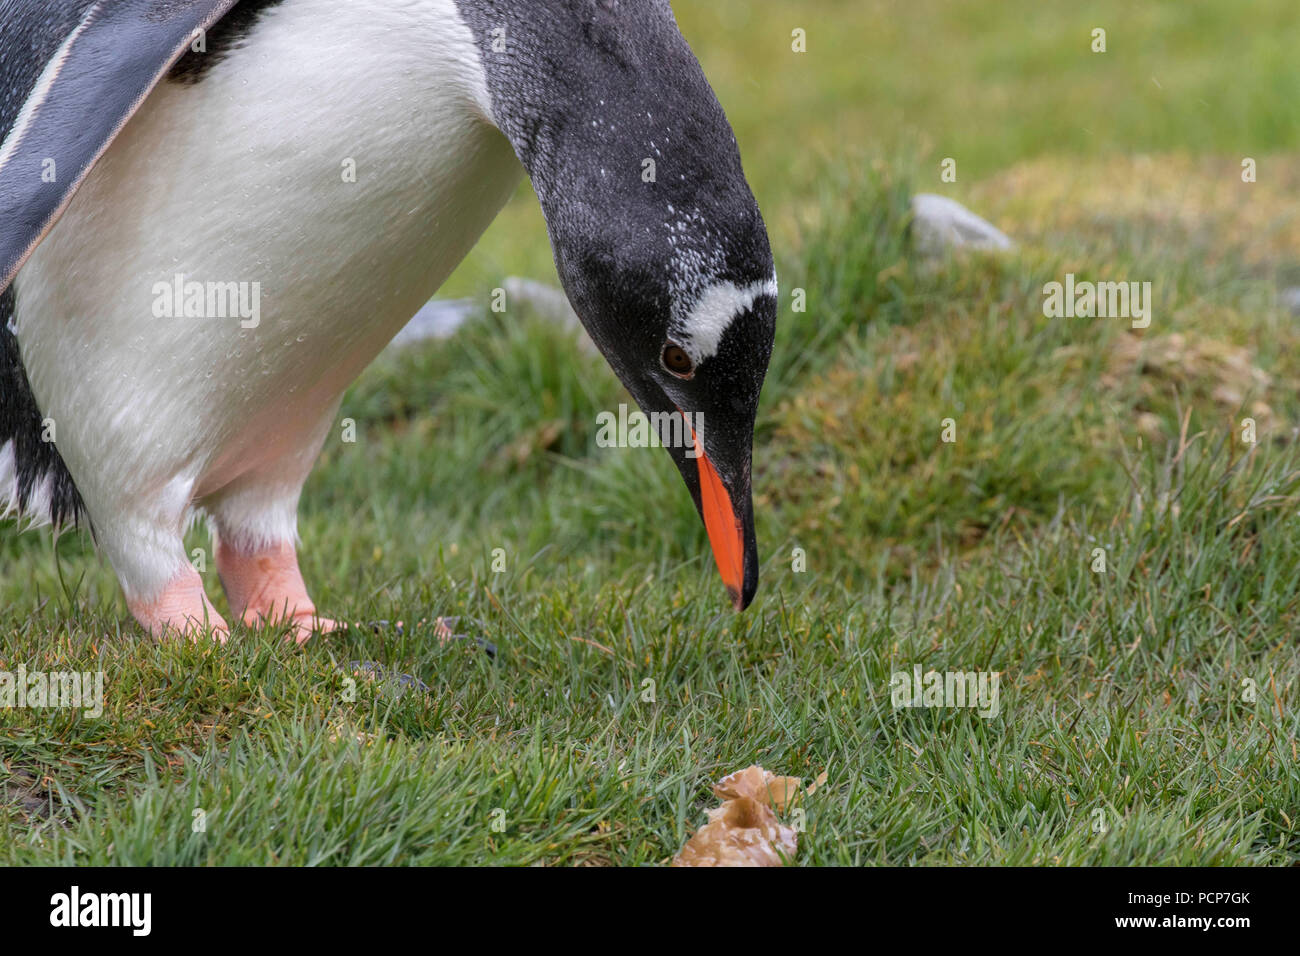 Curious gentoo penguin on  the South Georgia island - Stock Image